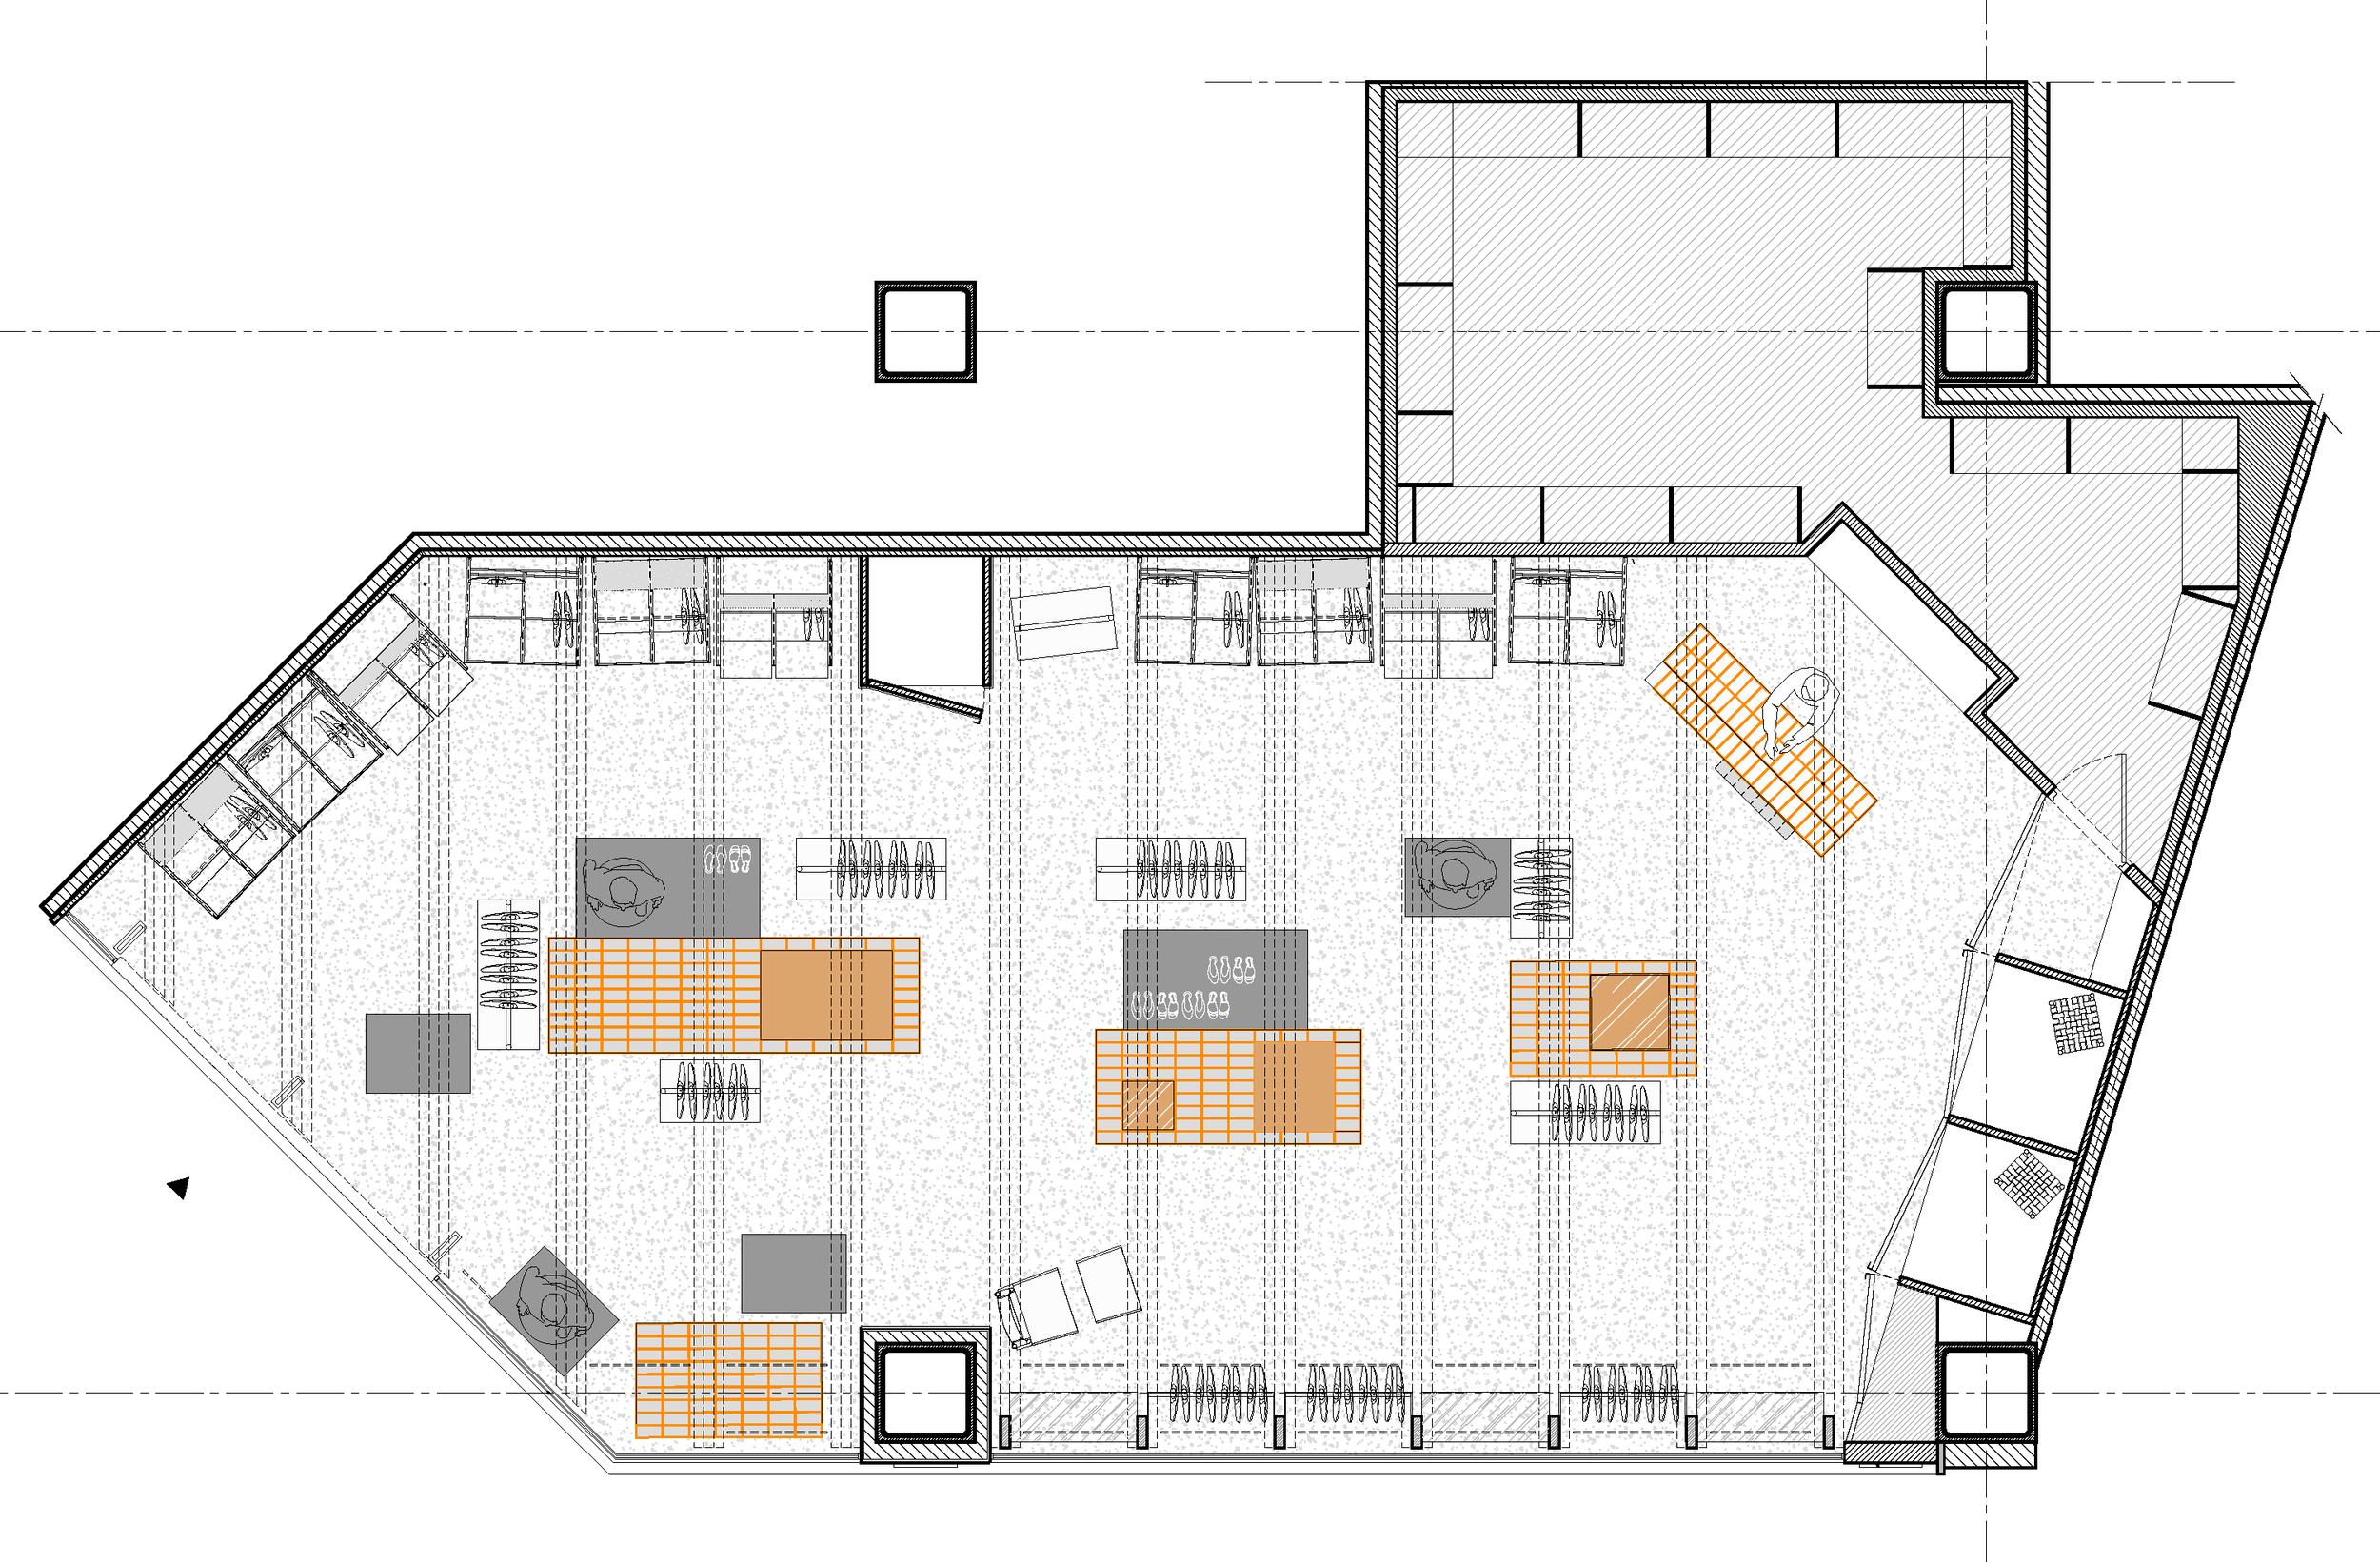 169_Spick&Span_Floorplan.png